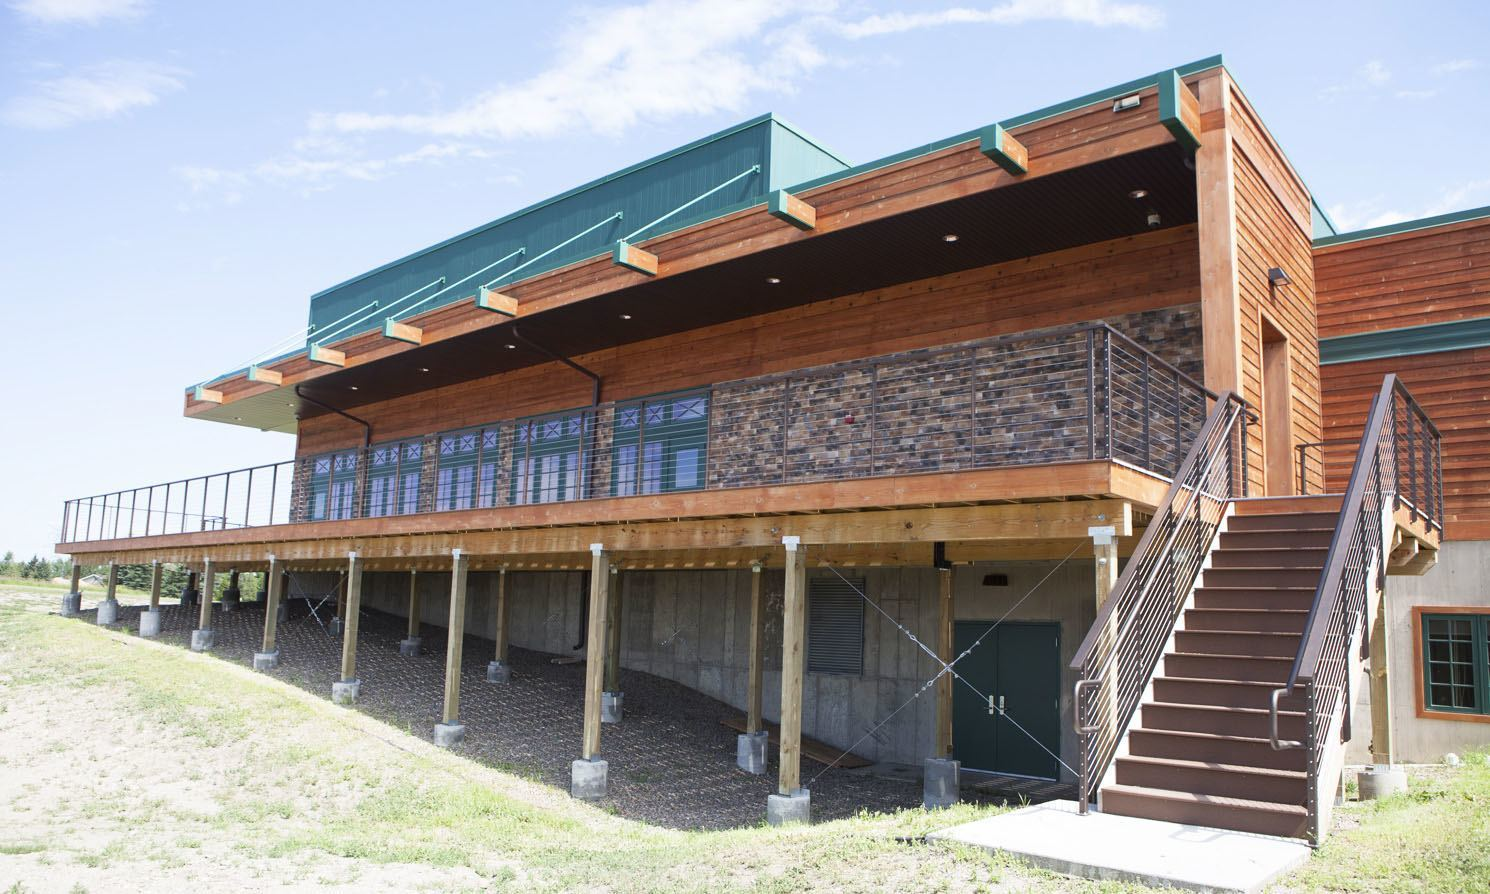 Keuka Studios railing on this Lewis and Clark building